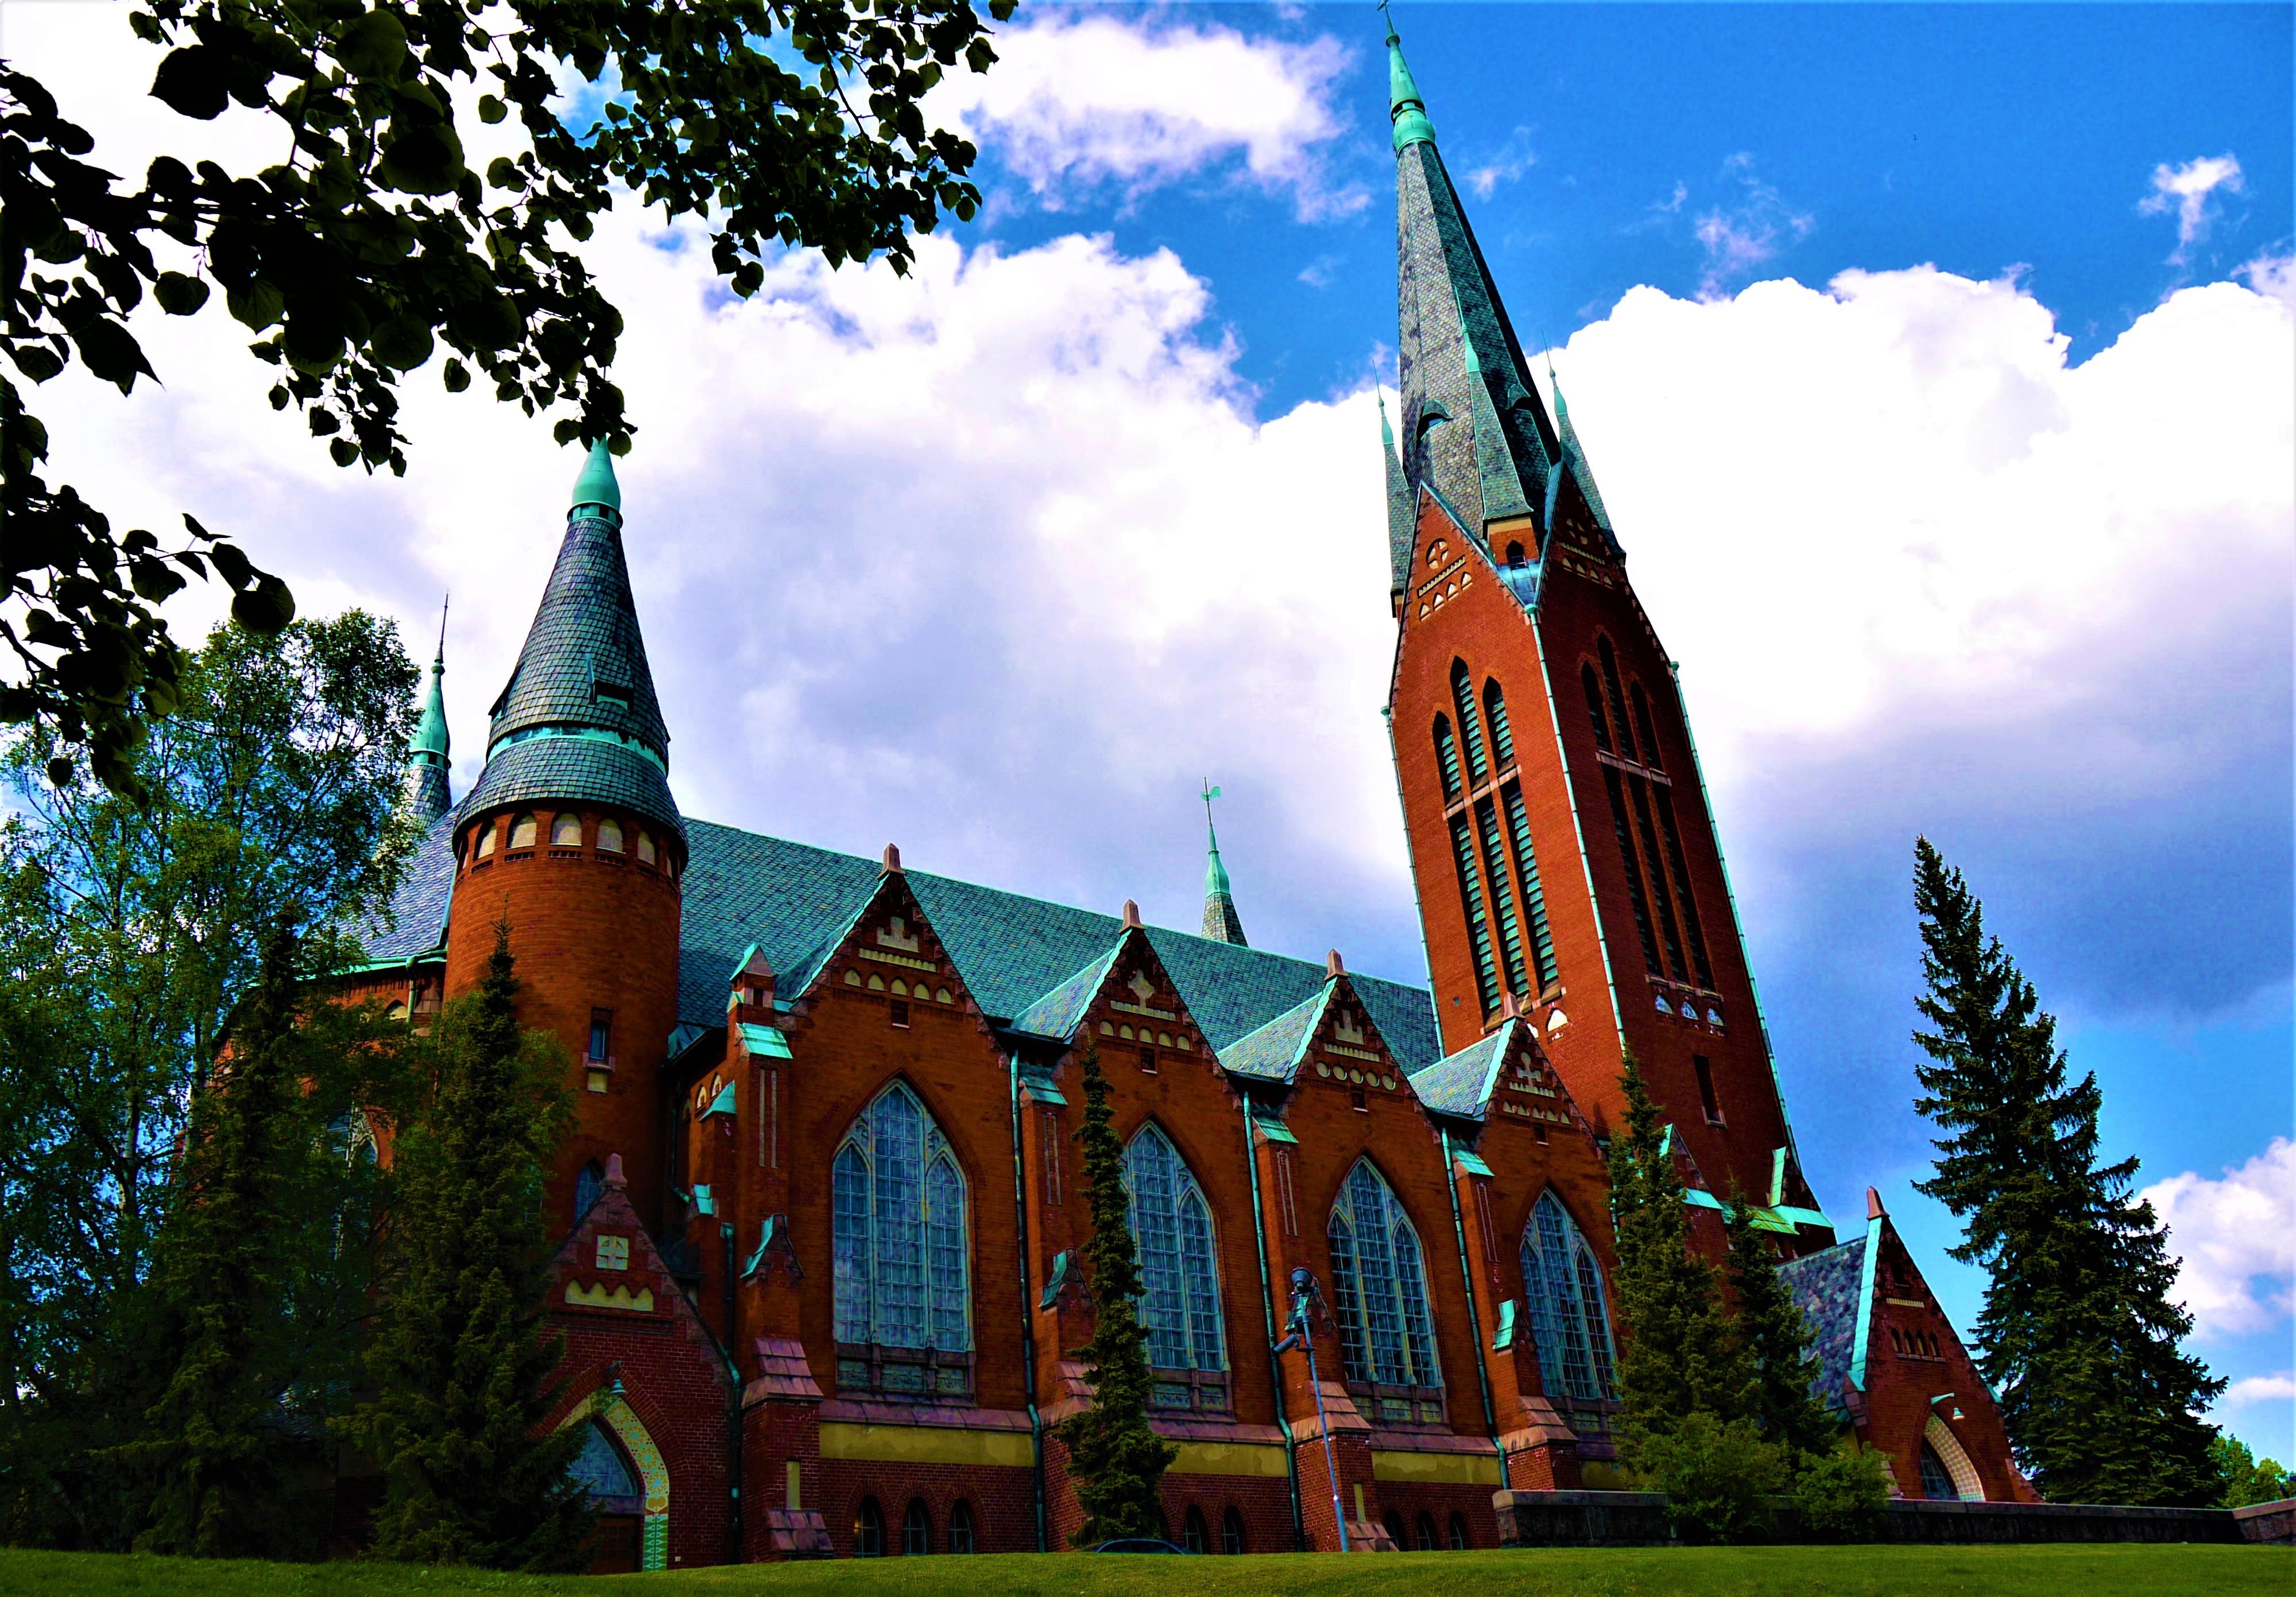 Michael's Church Turku